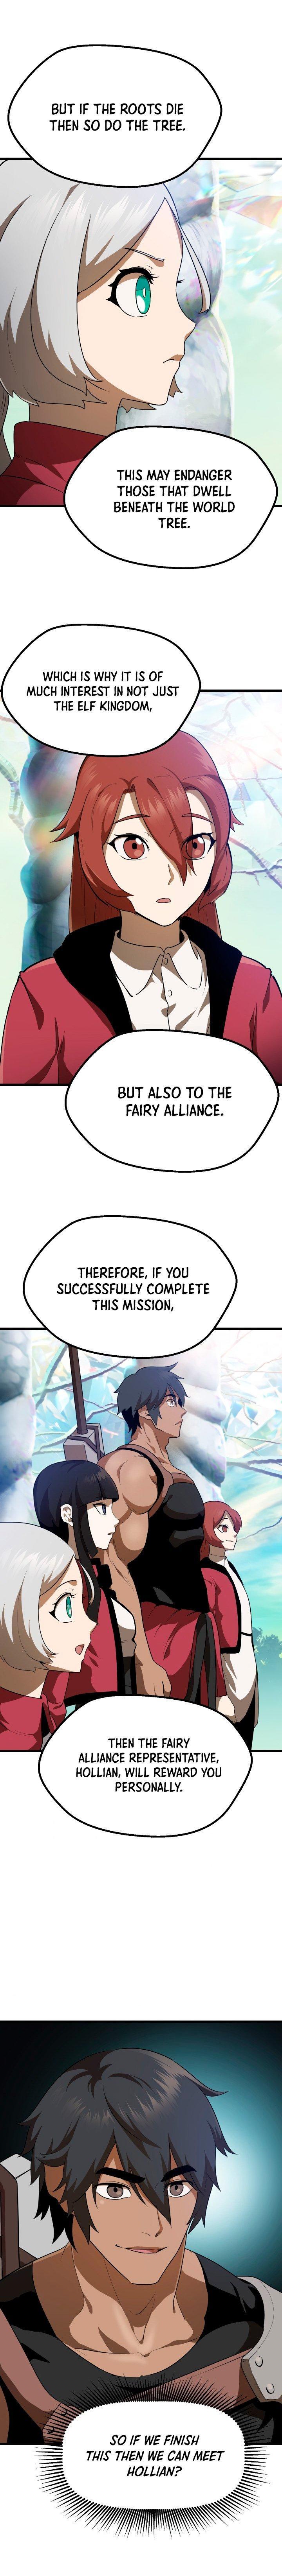 Survival Story Of A Sword King In A Fantasy World Chapter 78 page 8 - Mangakakalots.com